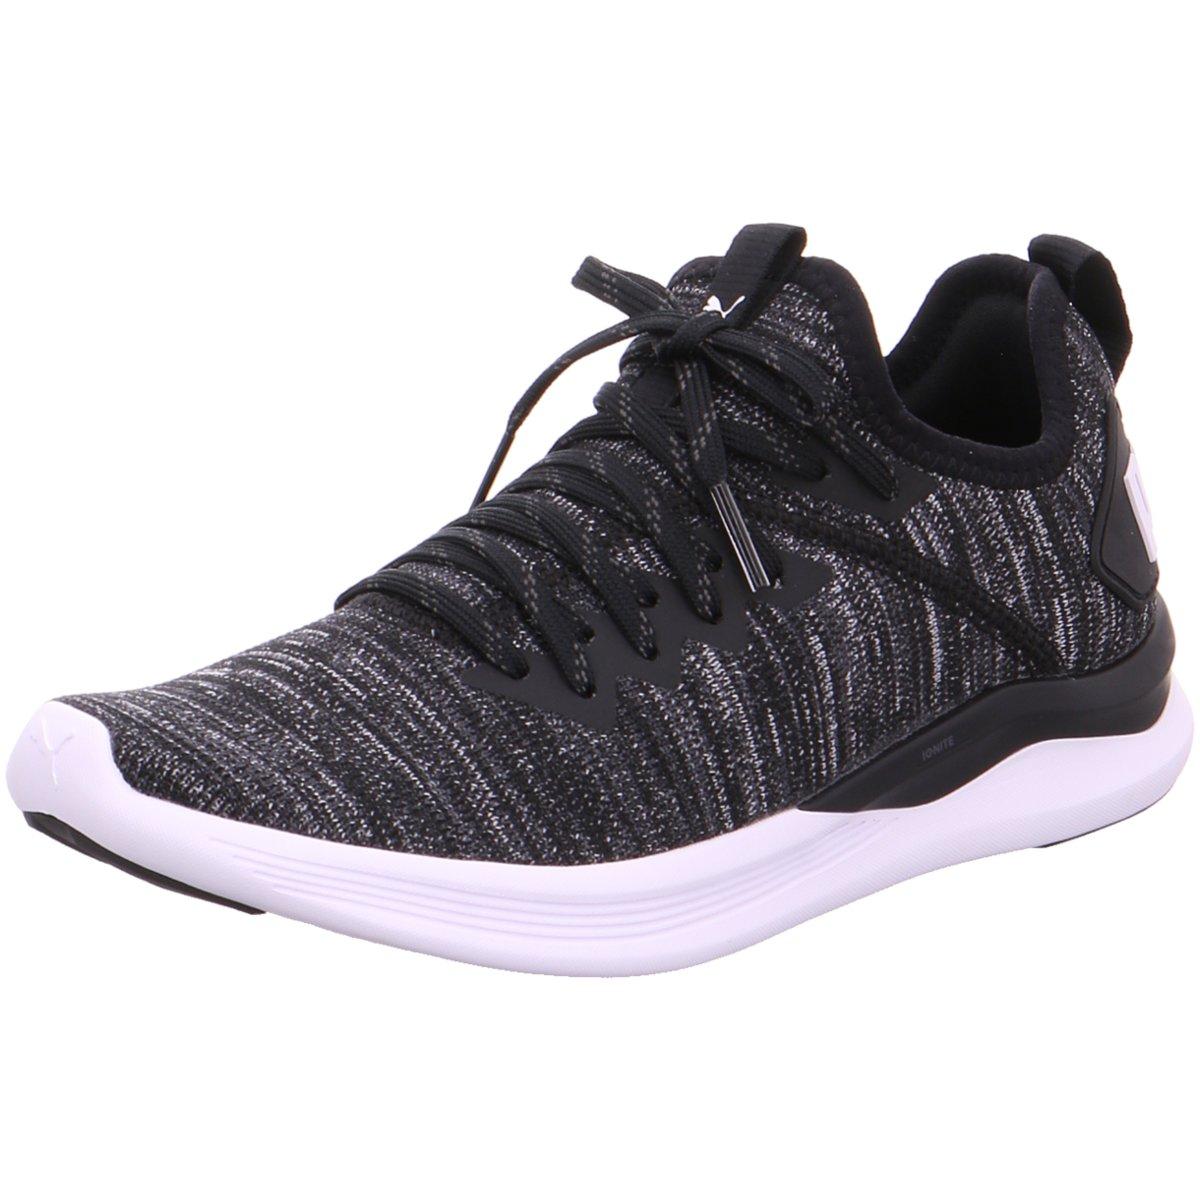 NEU Puma Damen Sneaker Ignite Flash evoKnit 190511/001 schwarz 411760